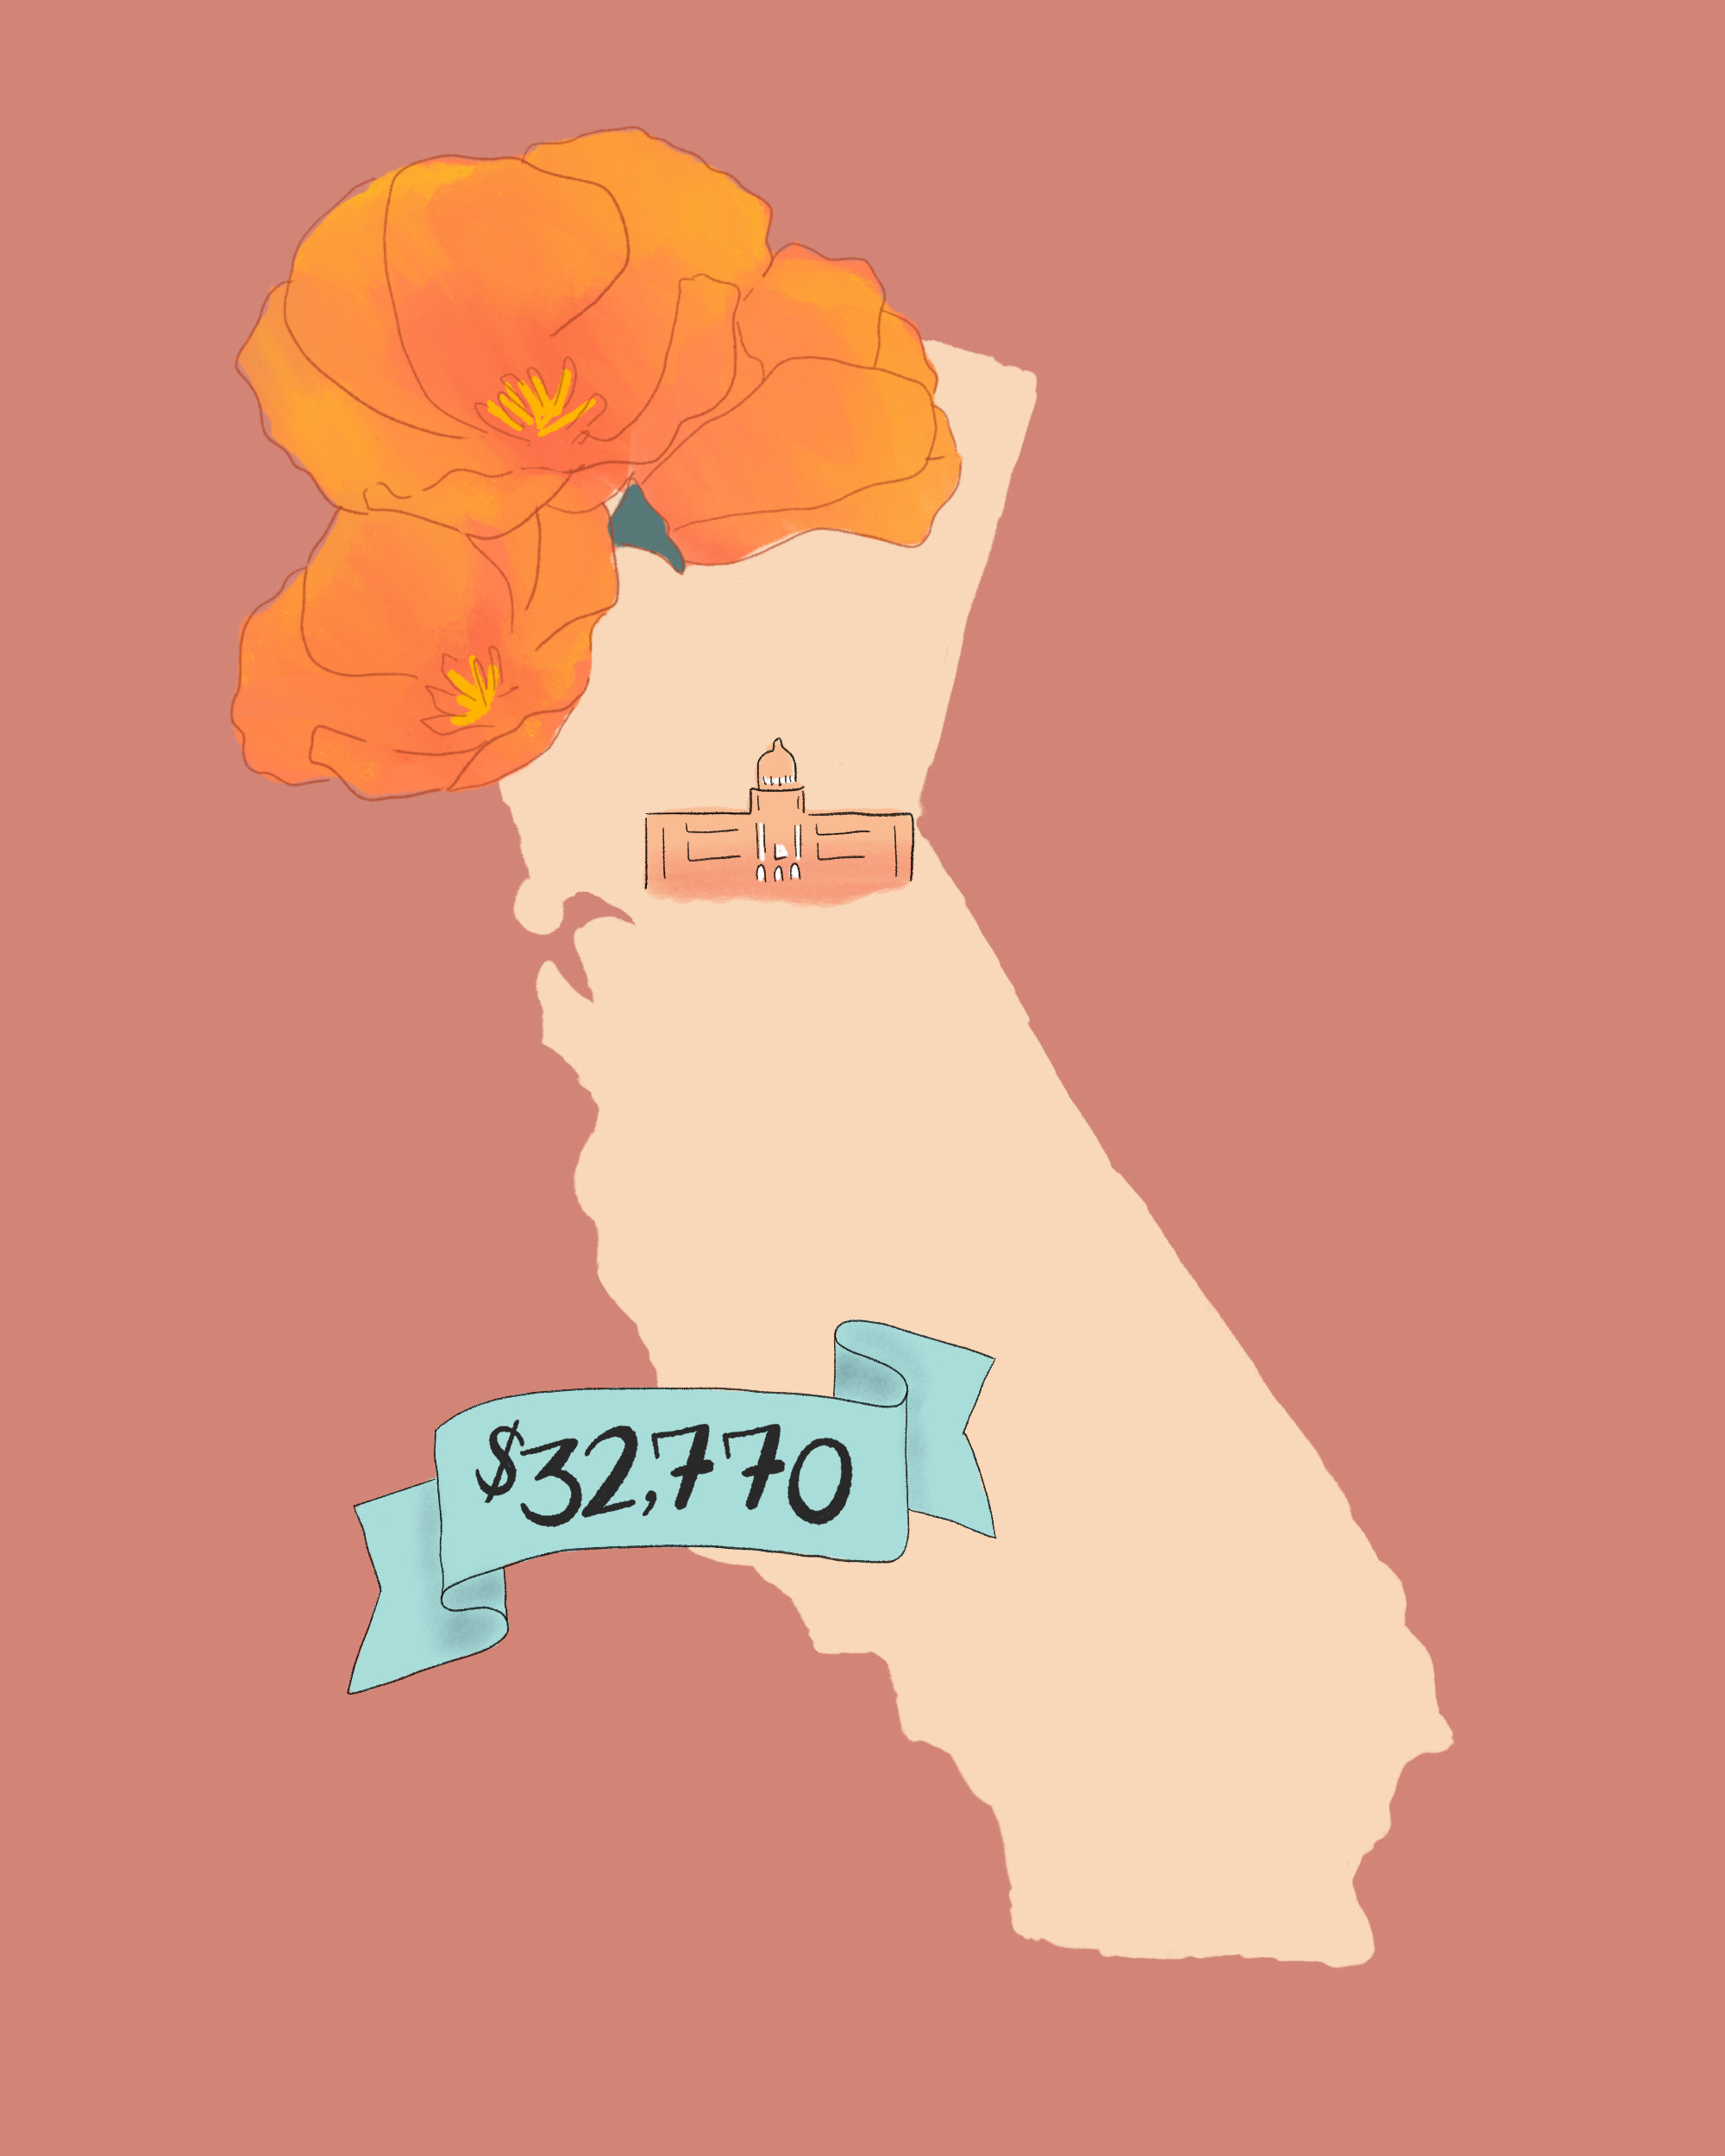 state wedding costs illustration california